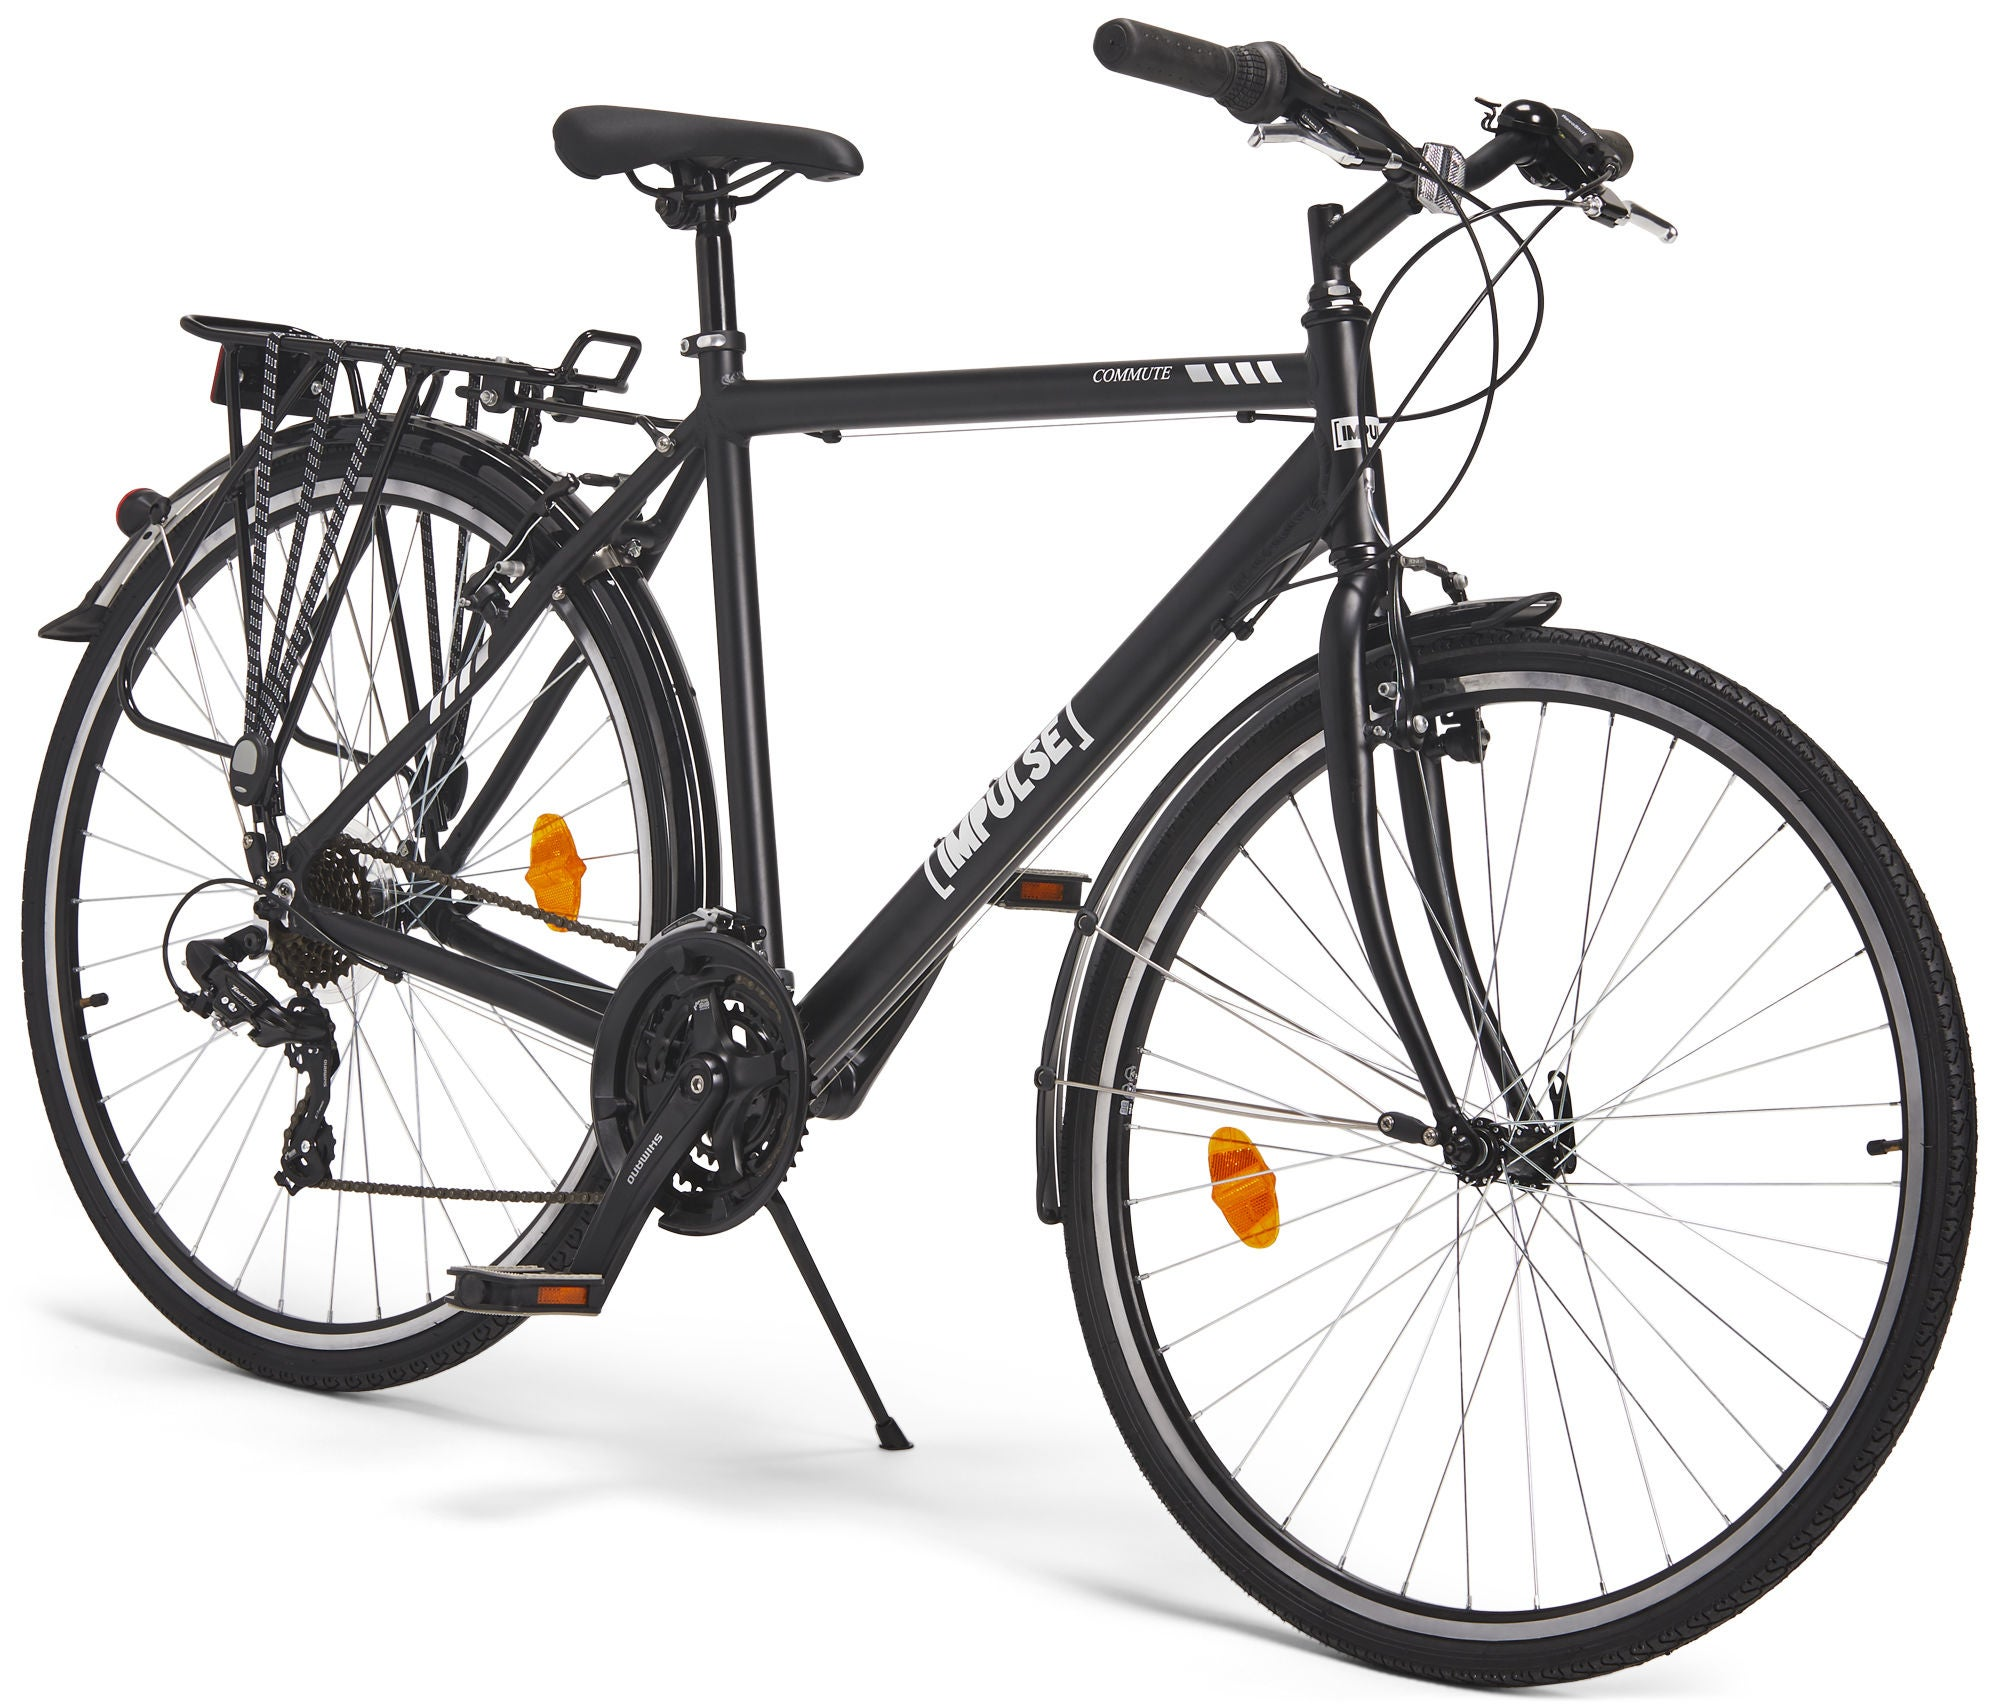 Impulse Premium Commute Cykel 28 Tommer, Black | City